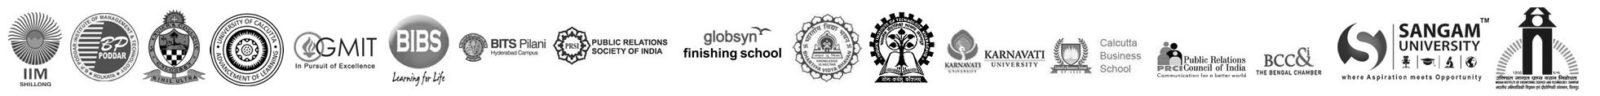 Seven Boats - Top Digital Marketing Institute in Kolkata, India offering best digital marketing course